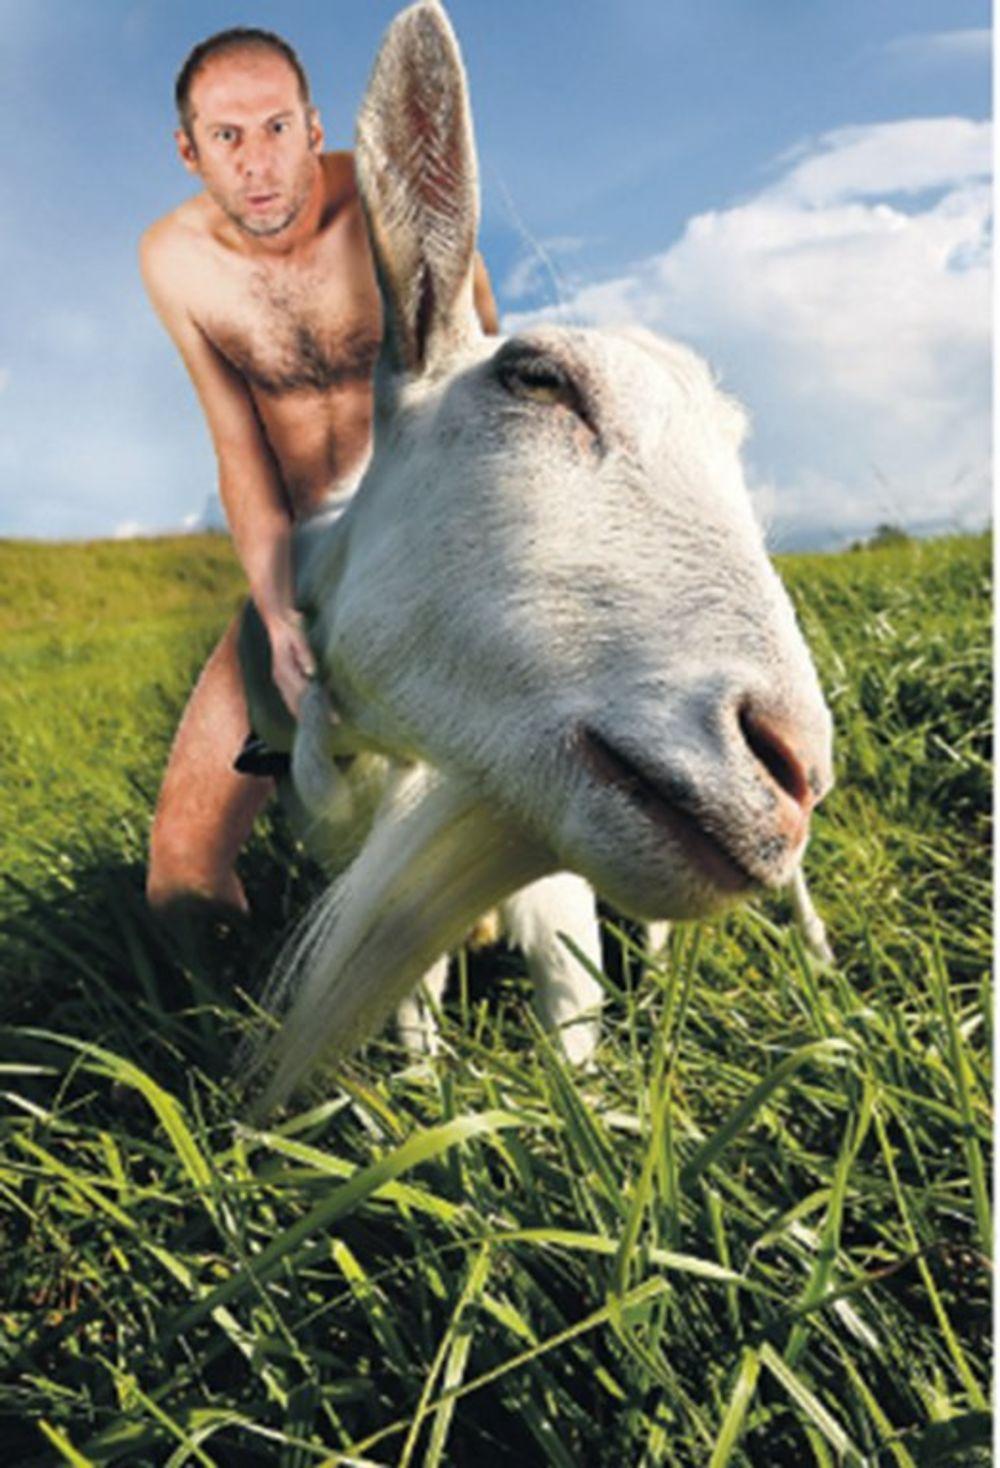 SODOMIJA: Albanac vezao pa silovao kozu! | Crna Hronika | Kurir